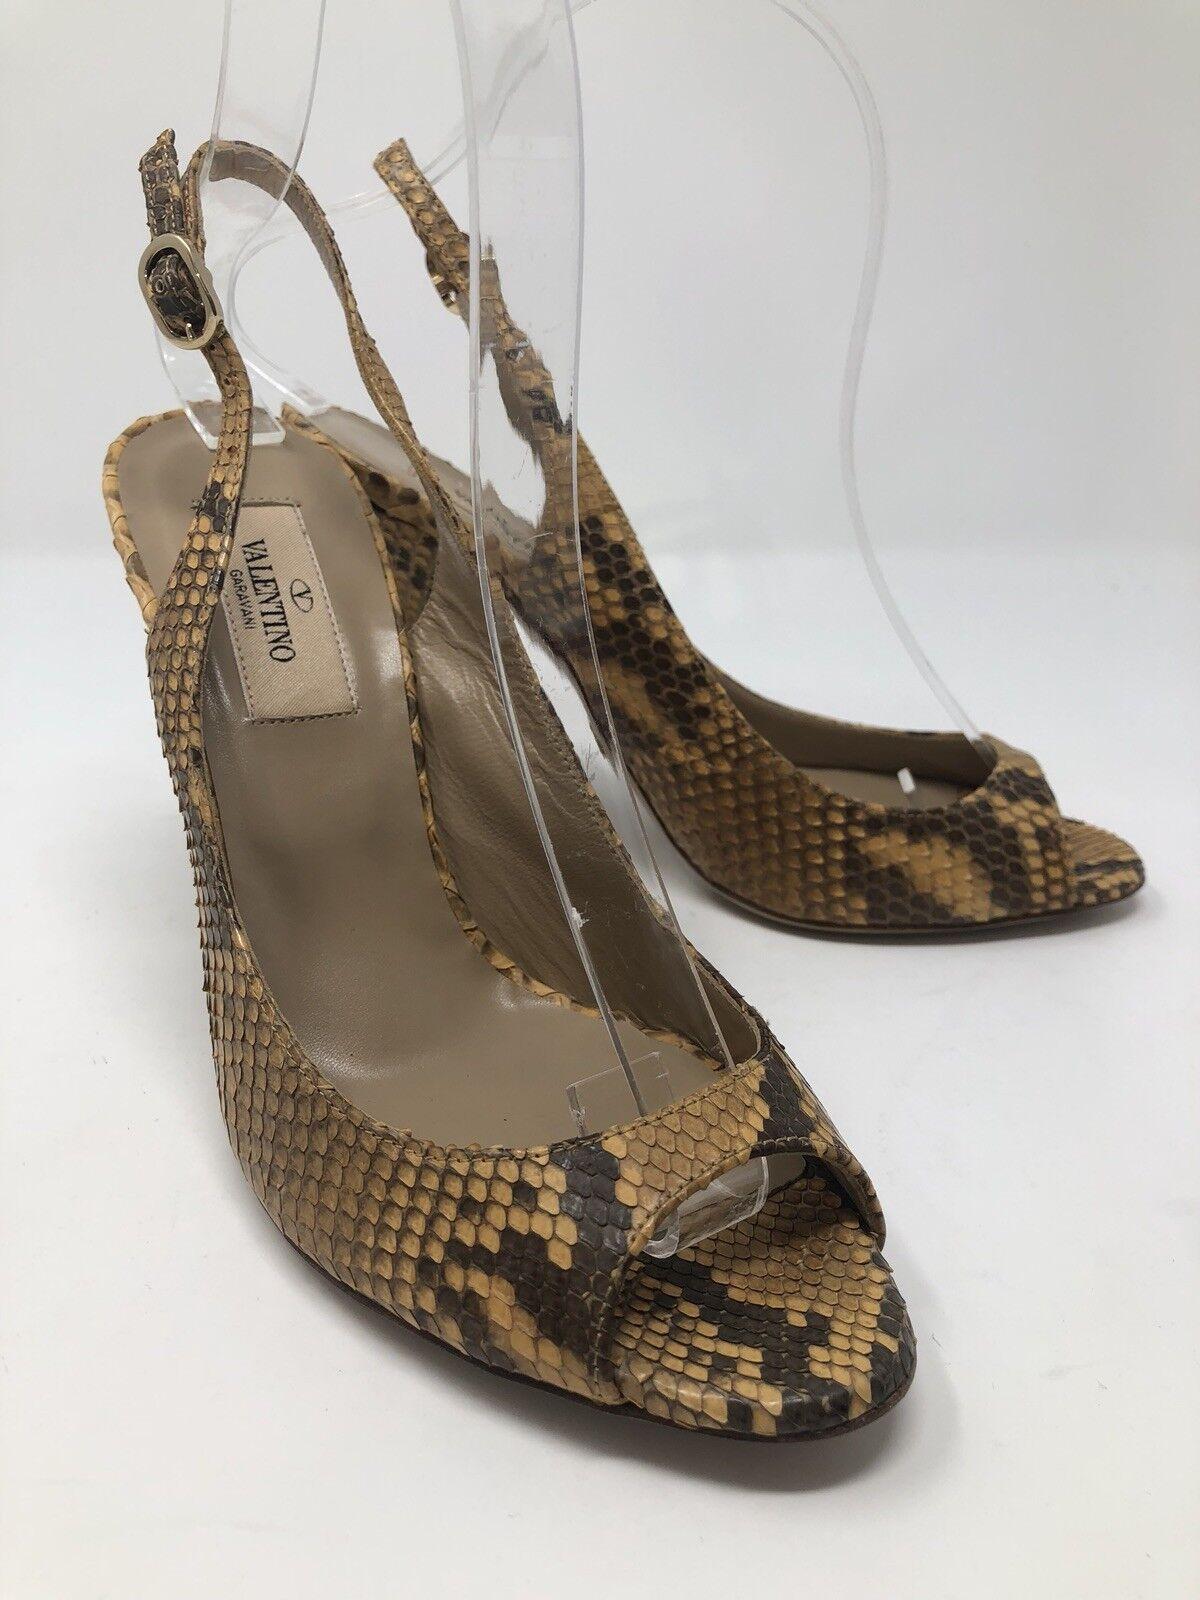 1100 New Valentino Garavani Womens Python Heels Ladies shoes Size 7 US 37 EU